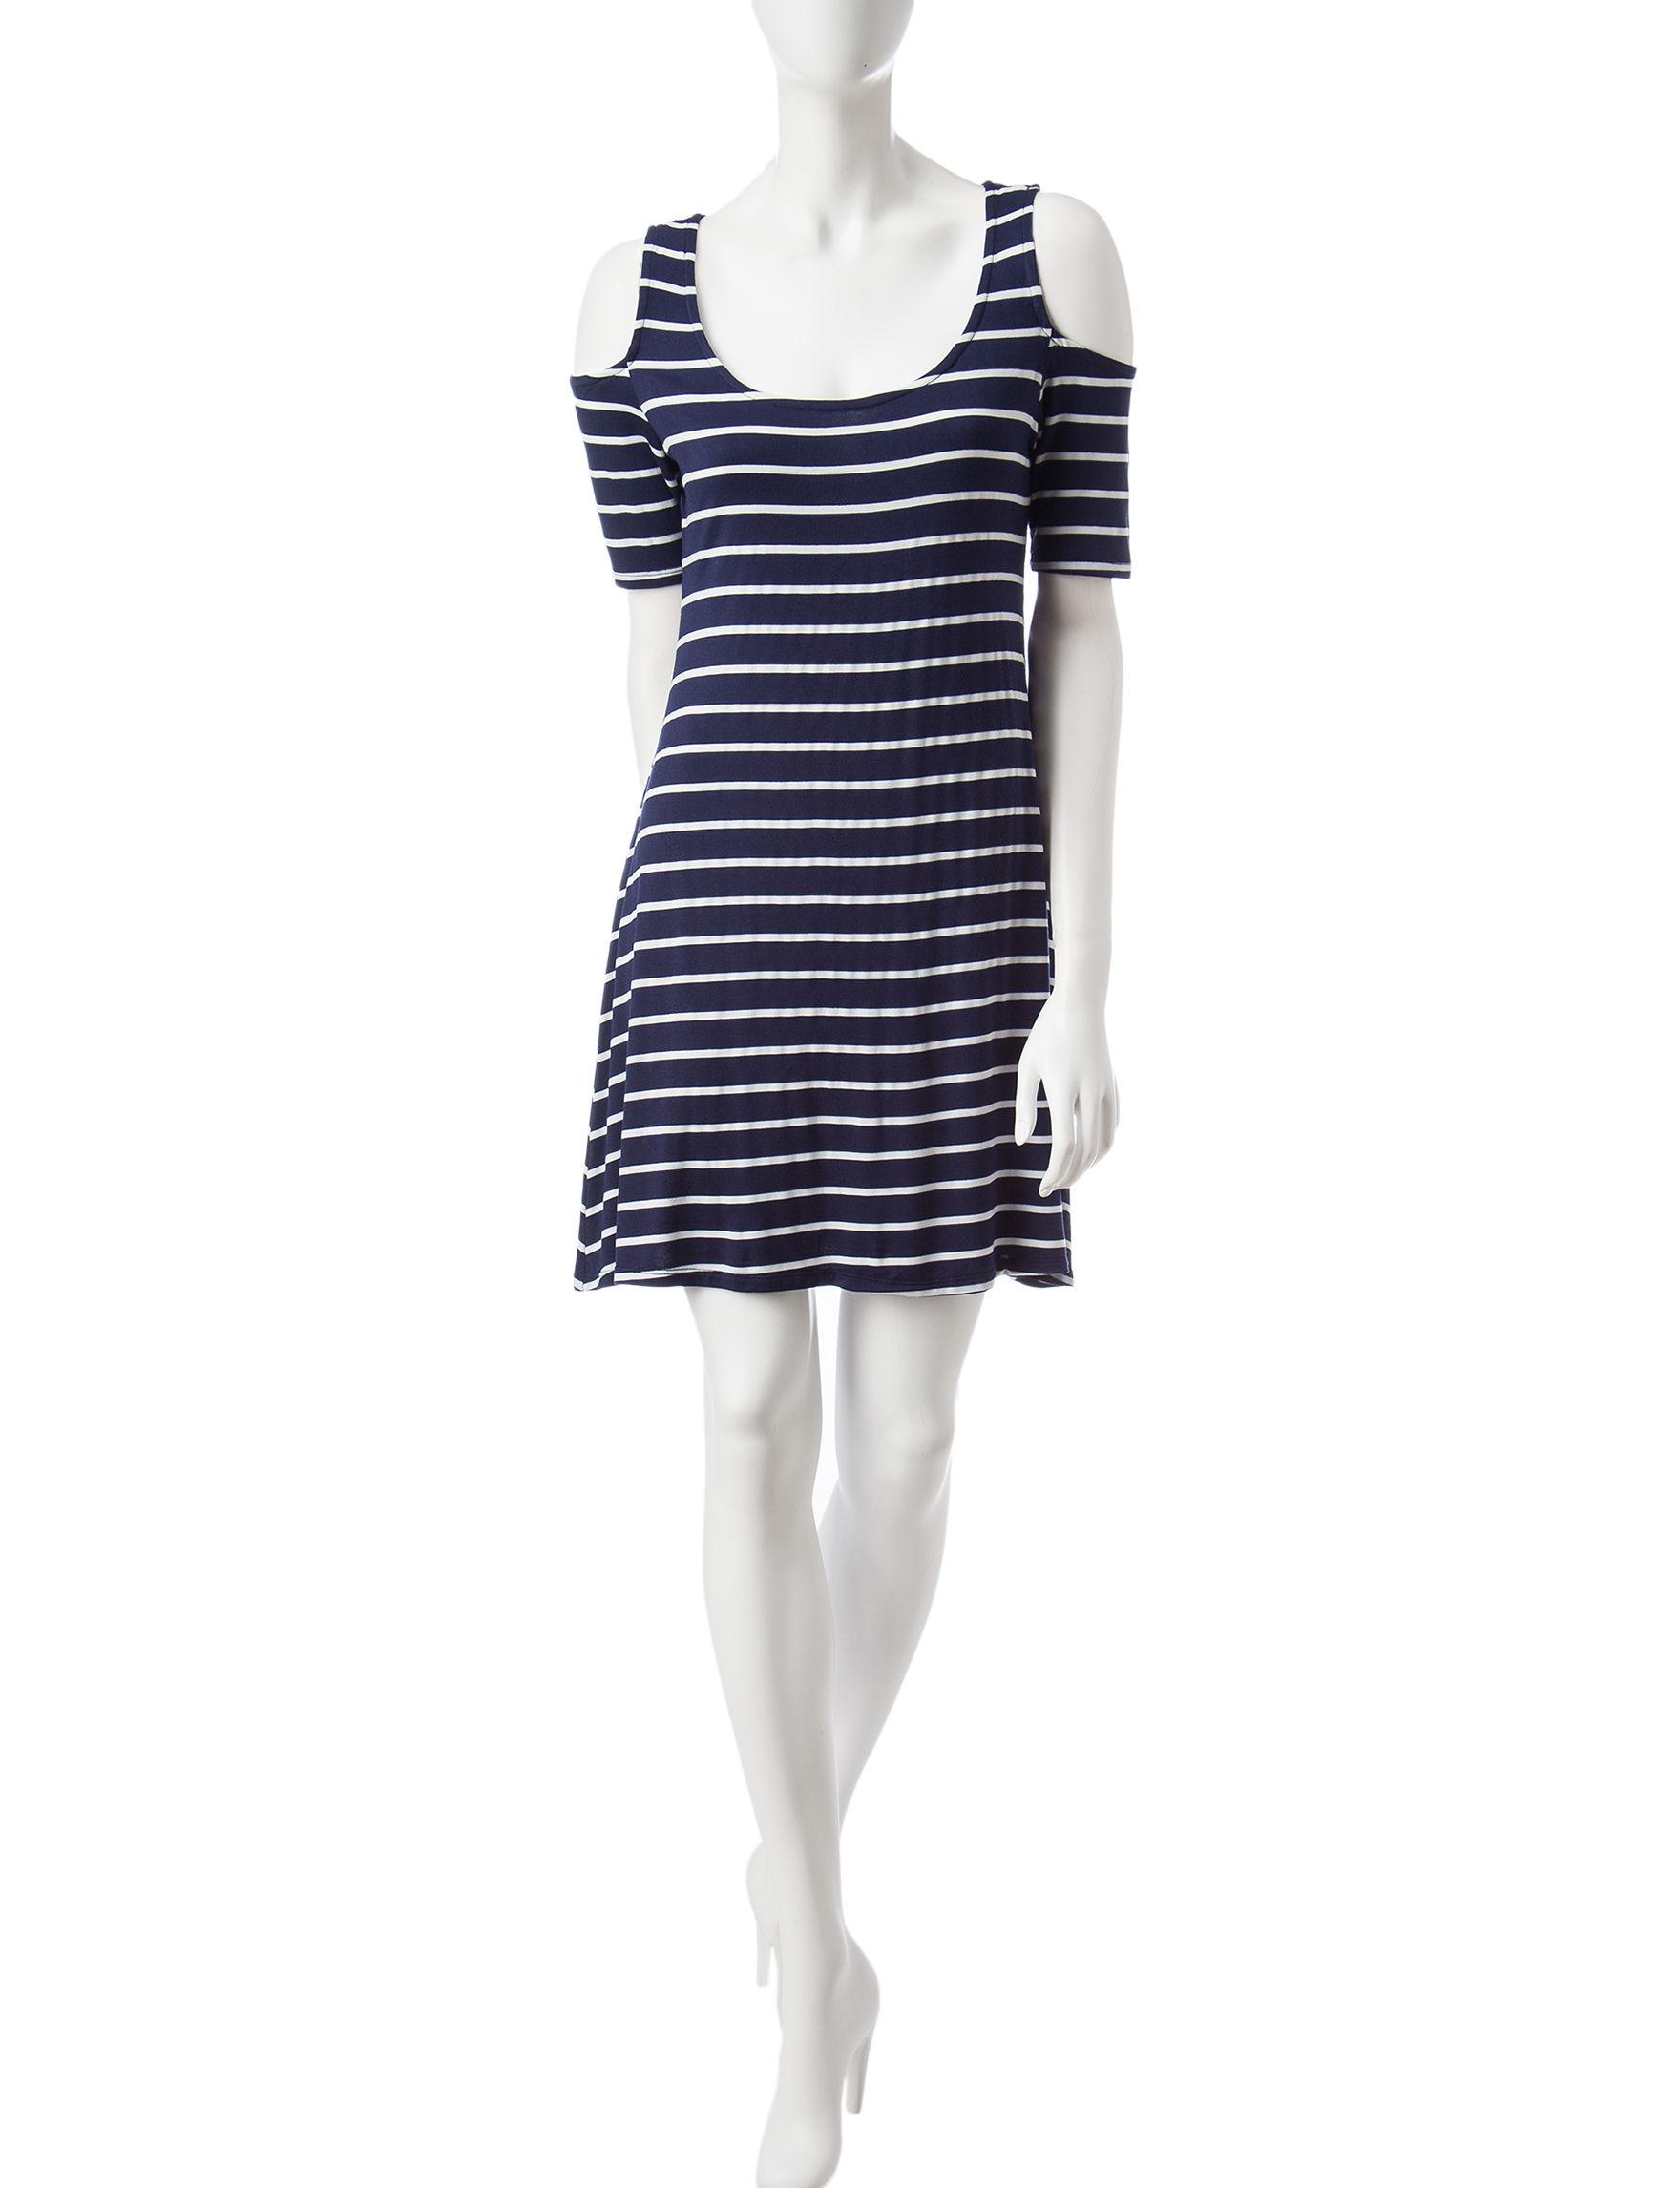 Wishful Park Navy Everyday & Casual Shirt Dresses